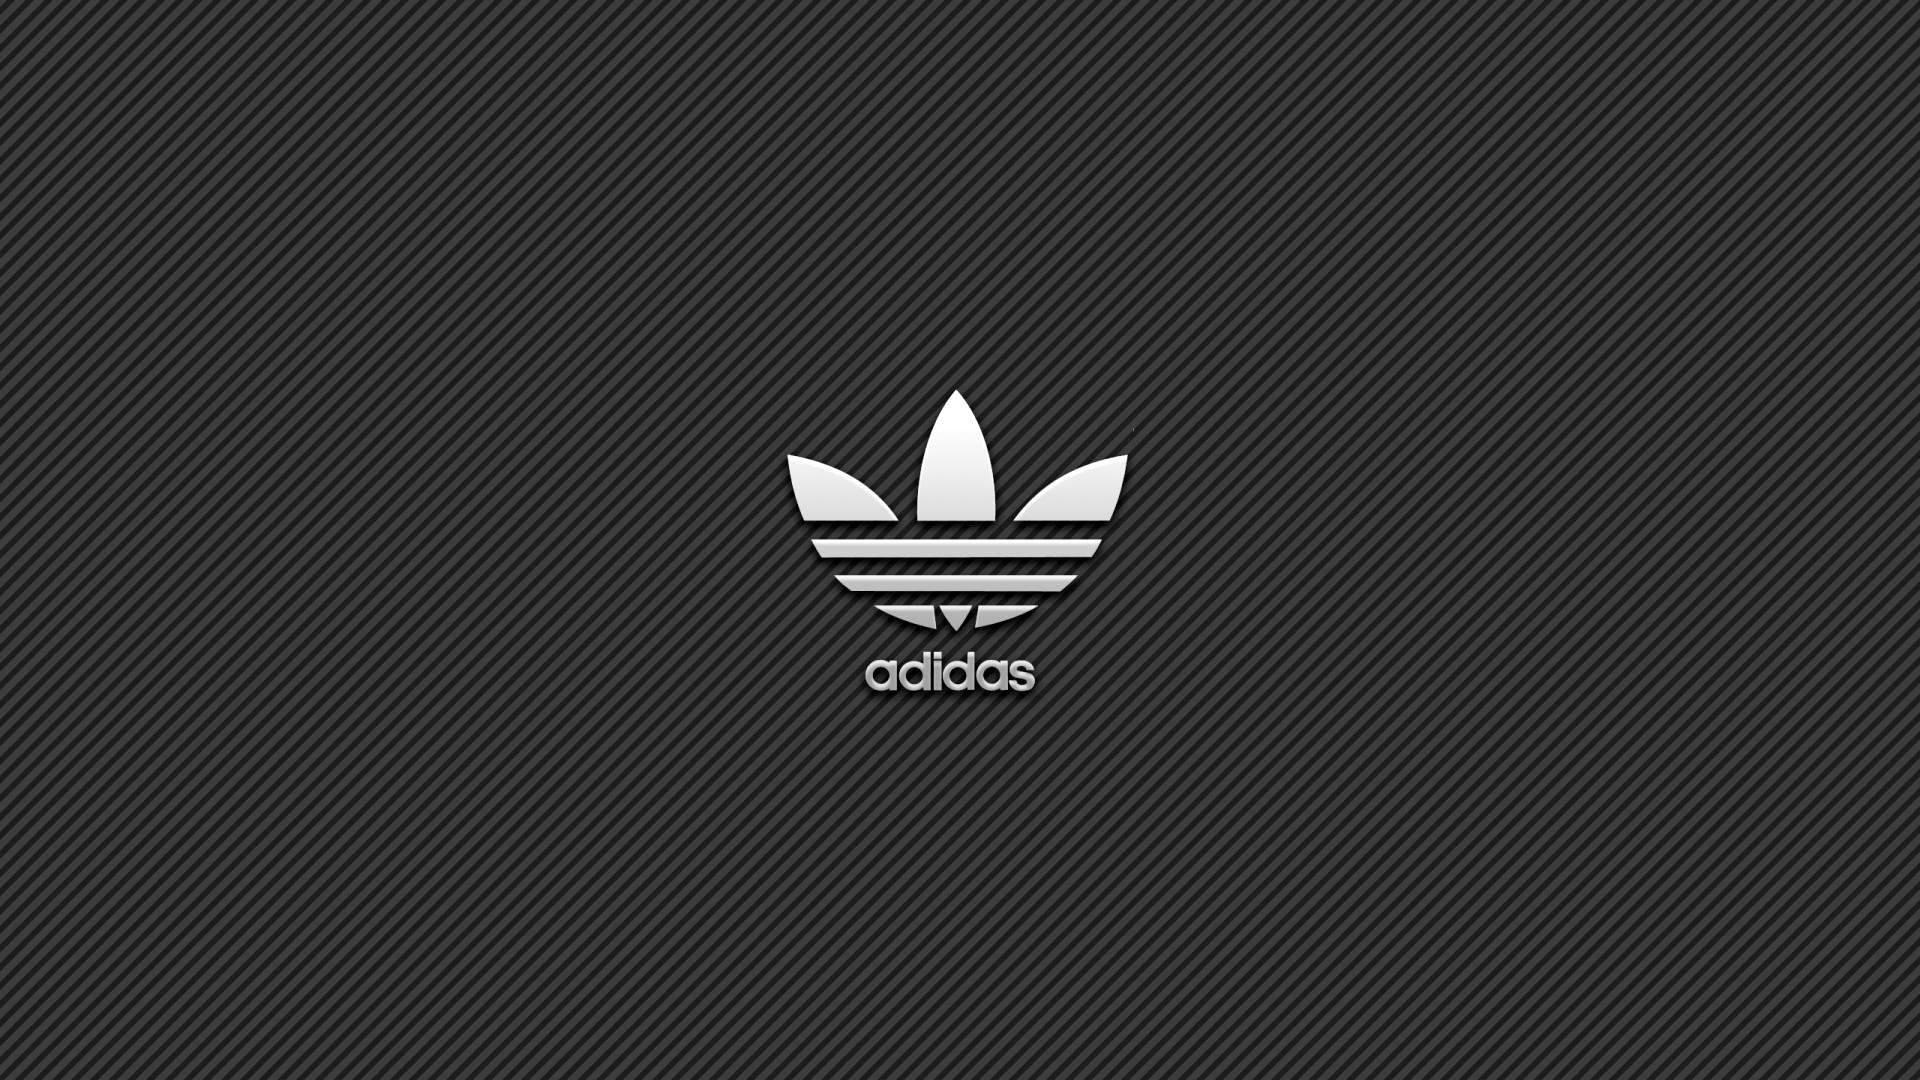 Wallpaper Logo Adidas (77+ images)